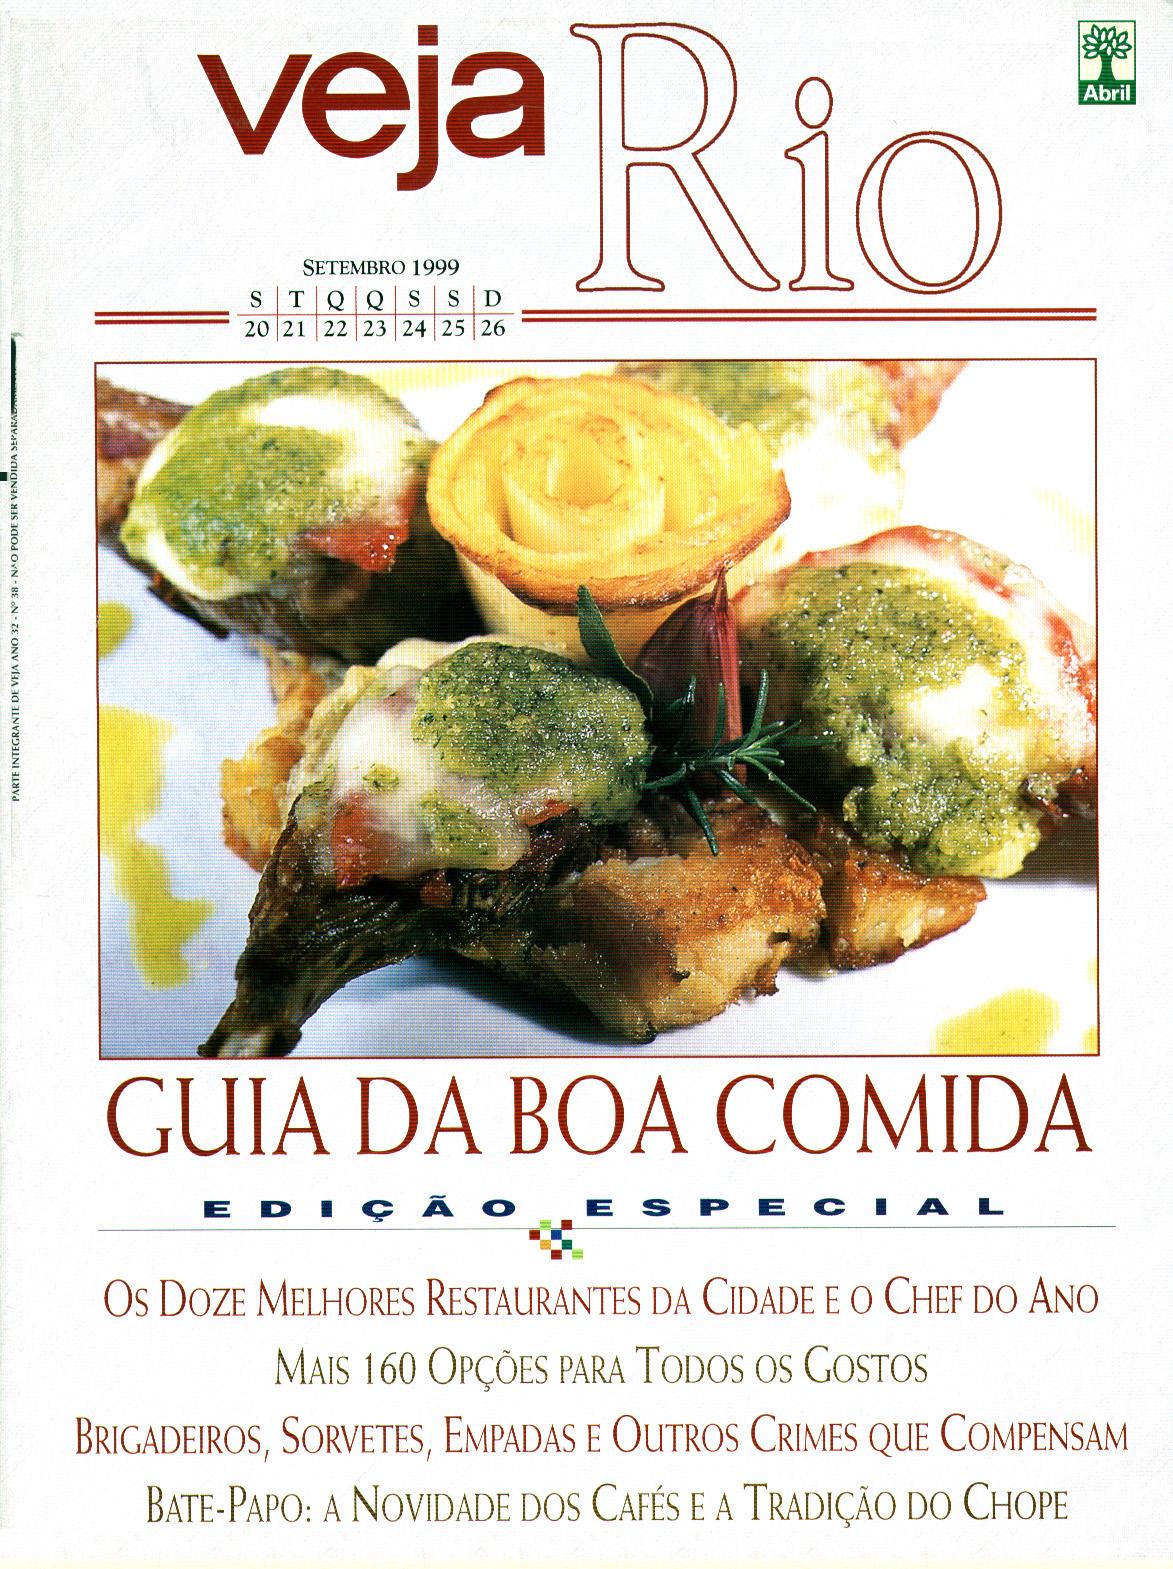 Capa da revista Veja Rio Especial Guia da Boa Comida, de 22 de setembro de 1999